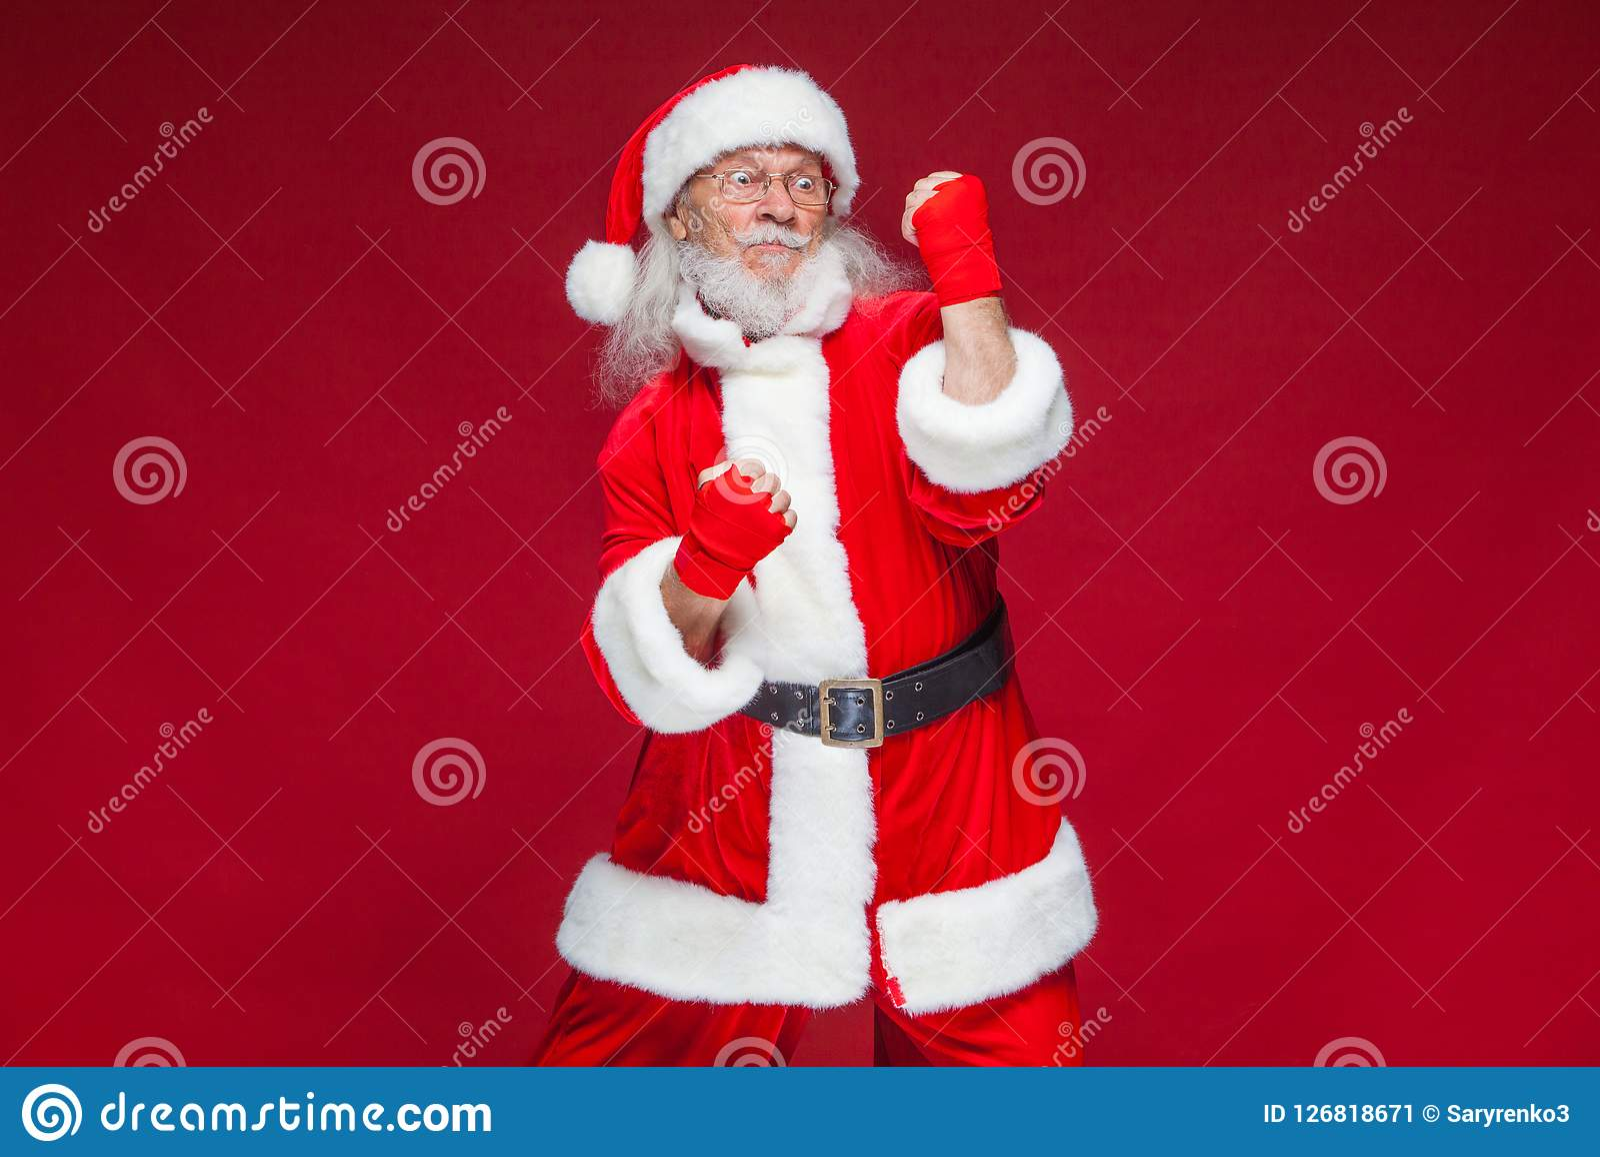 Kickboxing Santa Claus Stock Illustrations – 20 Kickboxing Santa Claus  Stock Illustrations, Vectors & Clipart - Dreamstime